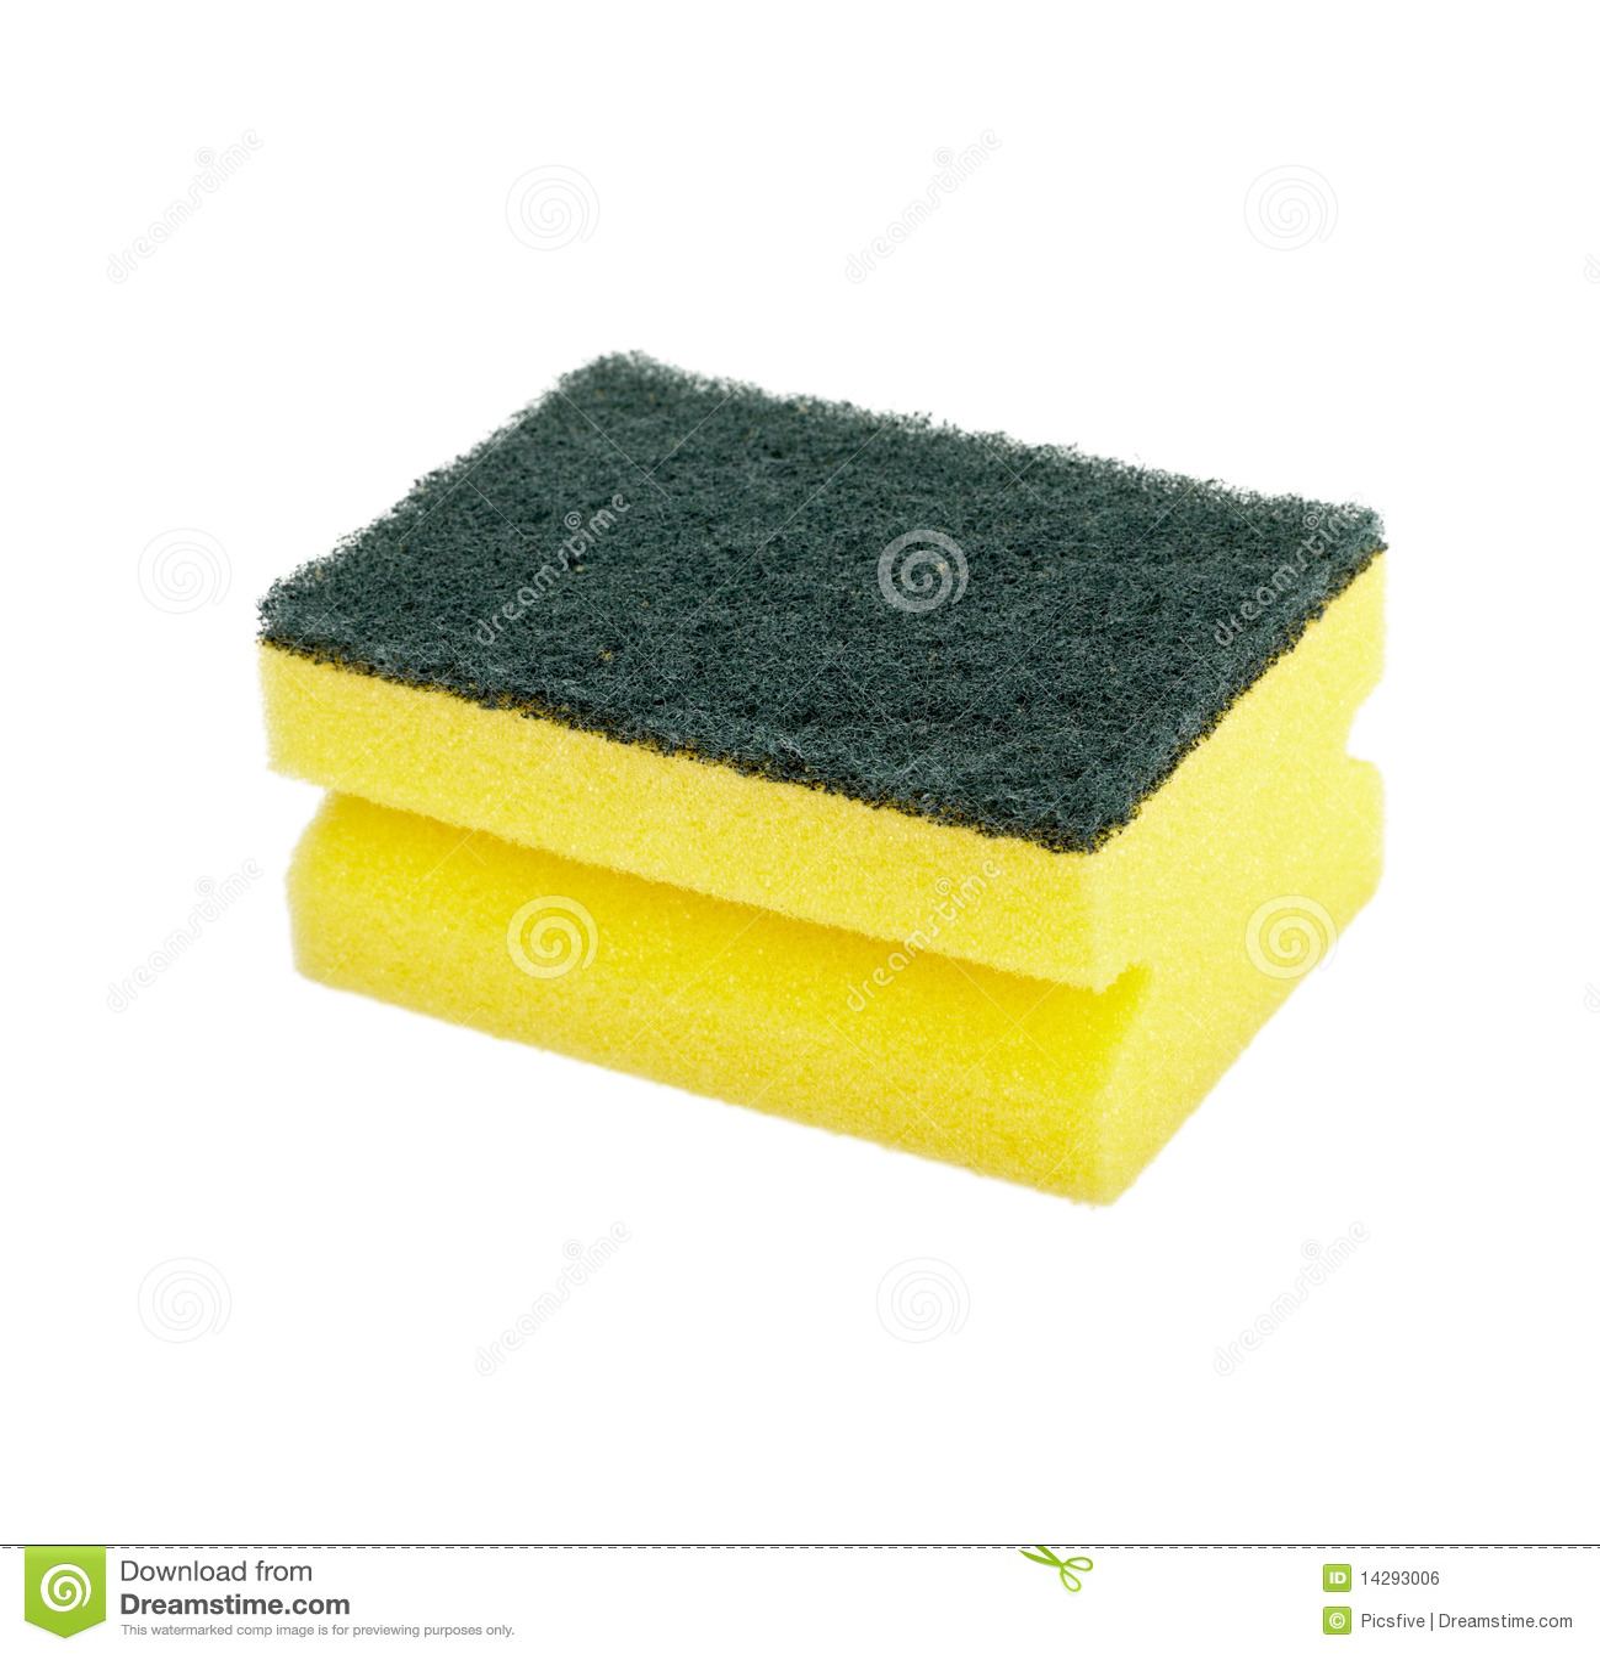 Kitchen utensil clip art - Dish Washing Sponge Foam Royalty Free Stock Image Image